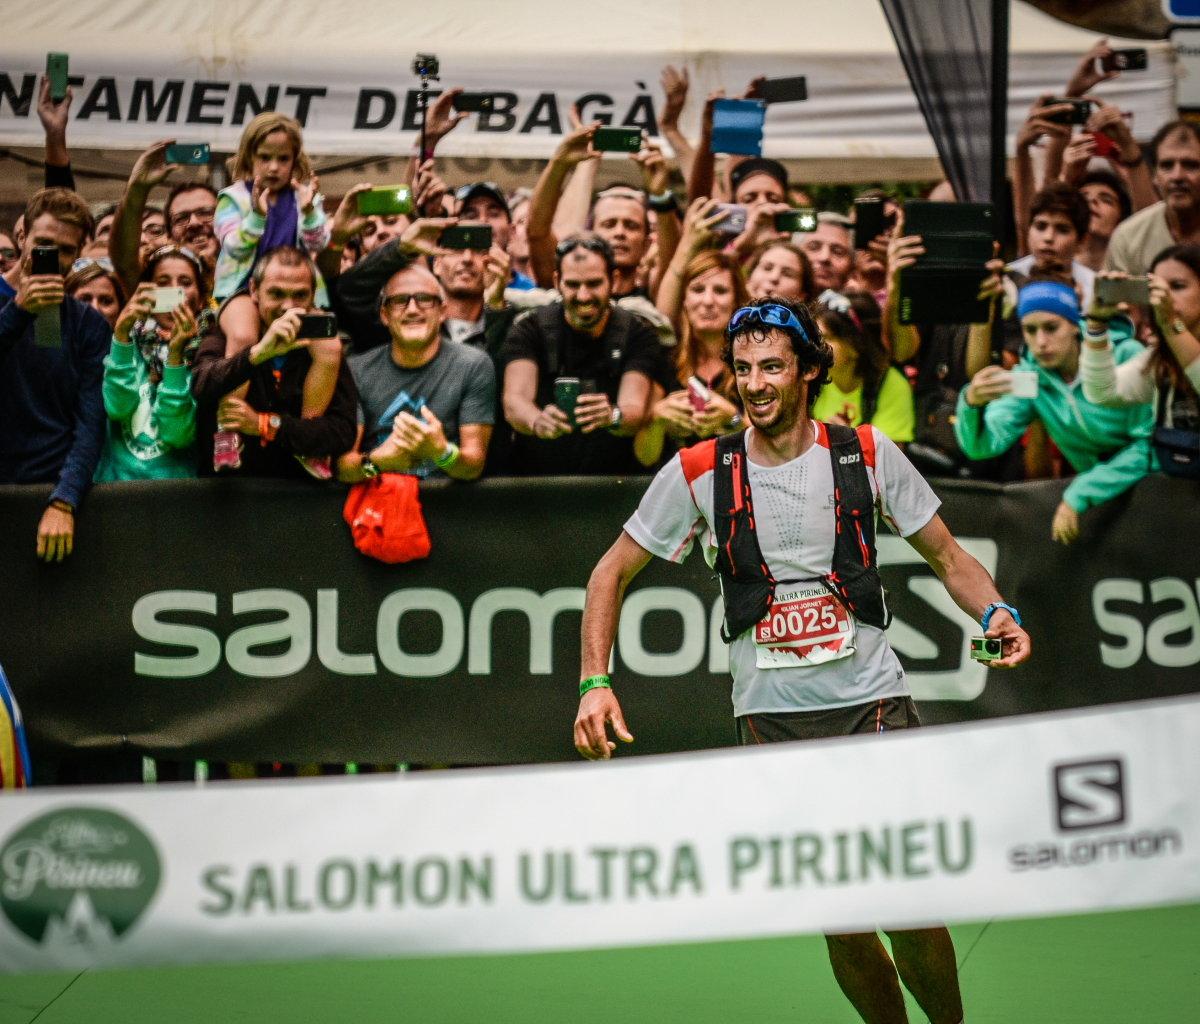 Winning the Ultra Pirineu 2015, 231 kb